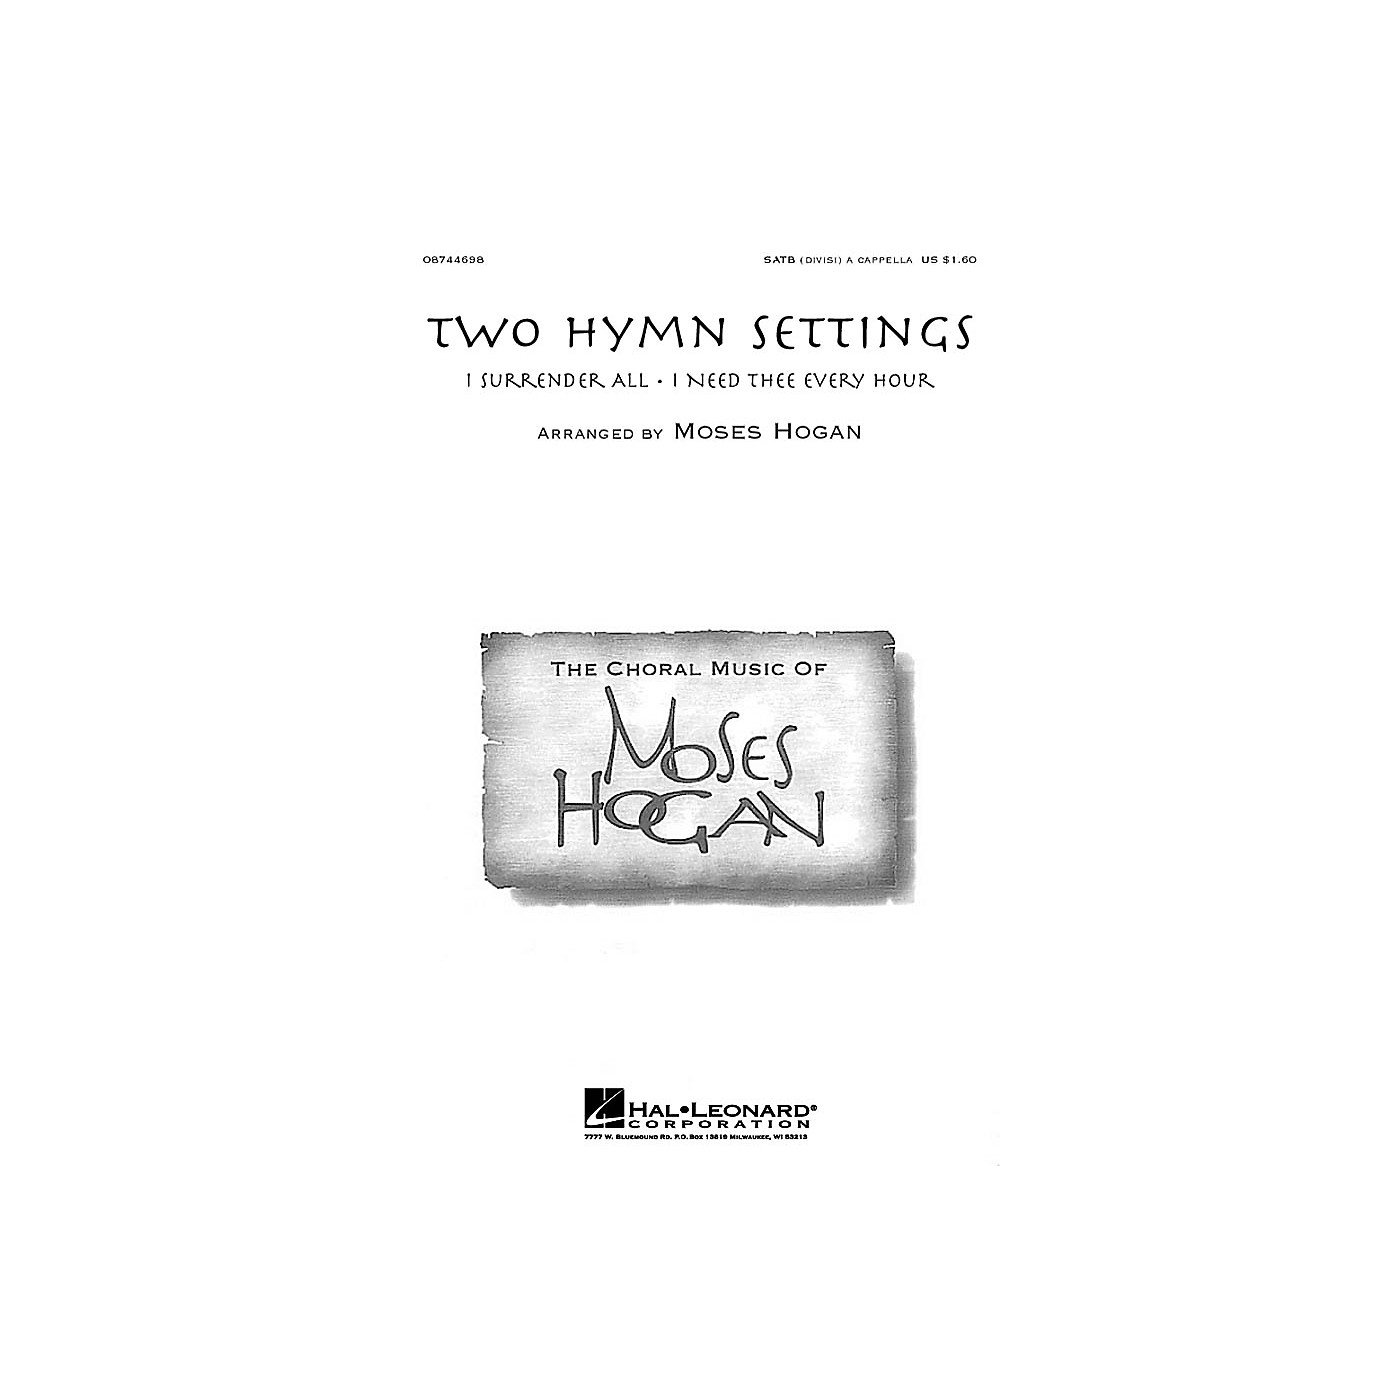 Hal Leonard Two Hymn Settings SATB DV A Cappella arranged by Moses Hogan thumbnail